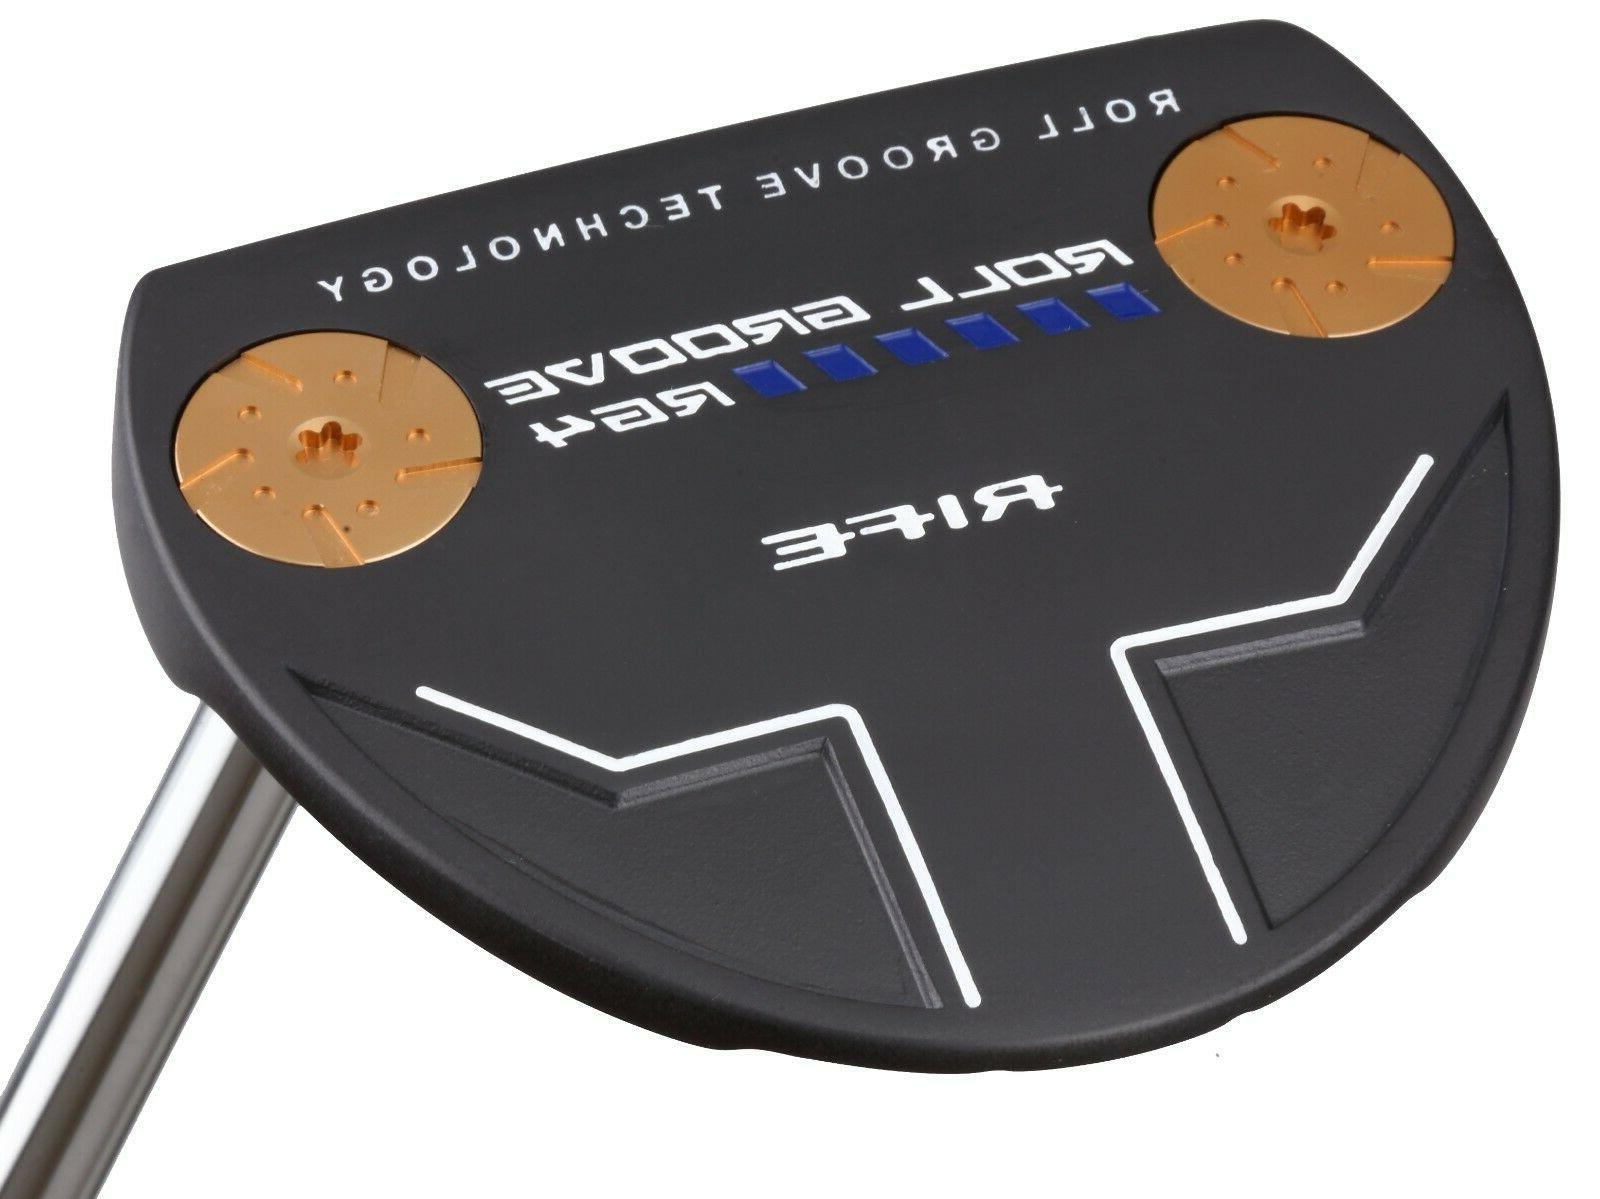 Rife Golf Roll Technology RG4